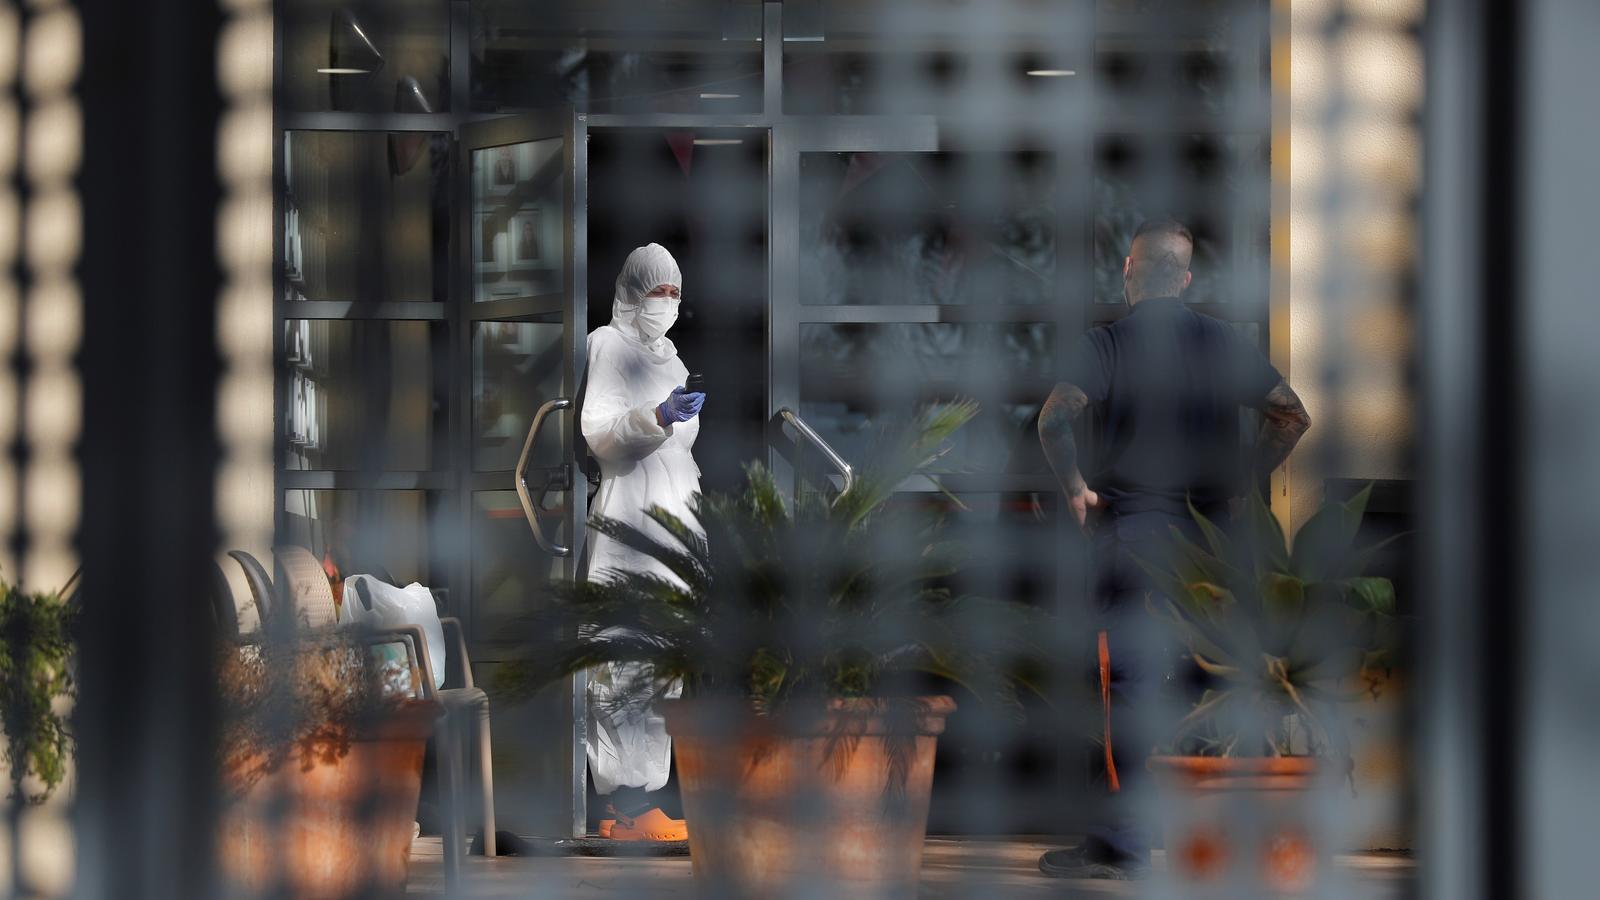 Un treballador al geriàtric de la Pobla de Vallbona (Camp de Túria) on 64 residents han estat contagiats per coronavirus